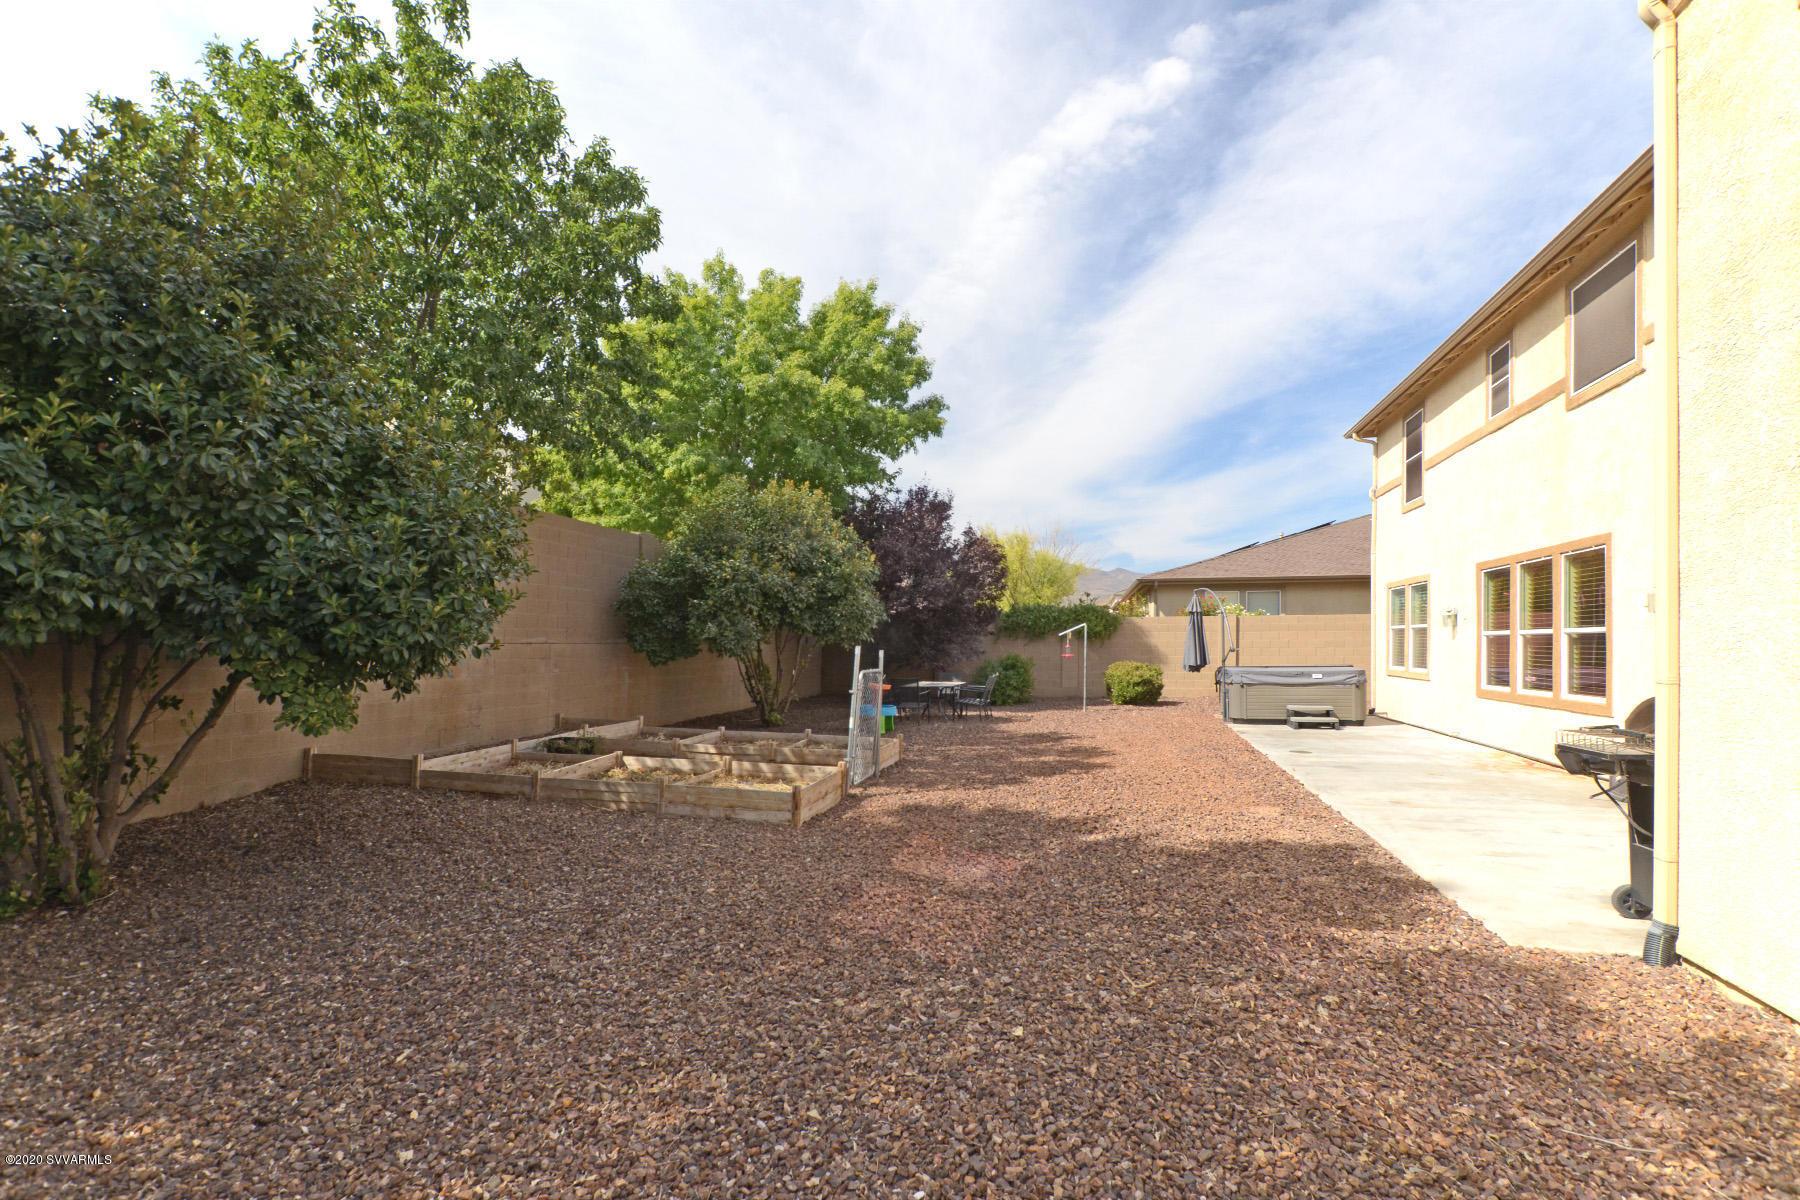 457 Miners Gulch Drive Clarkdale, AZ 86324